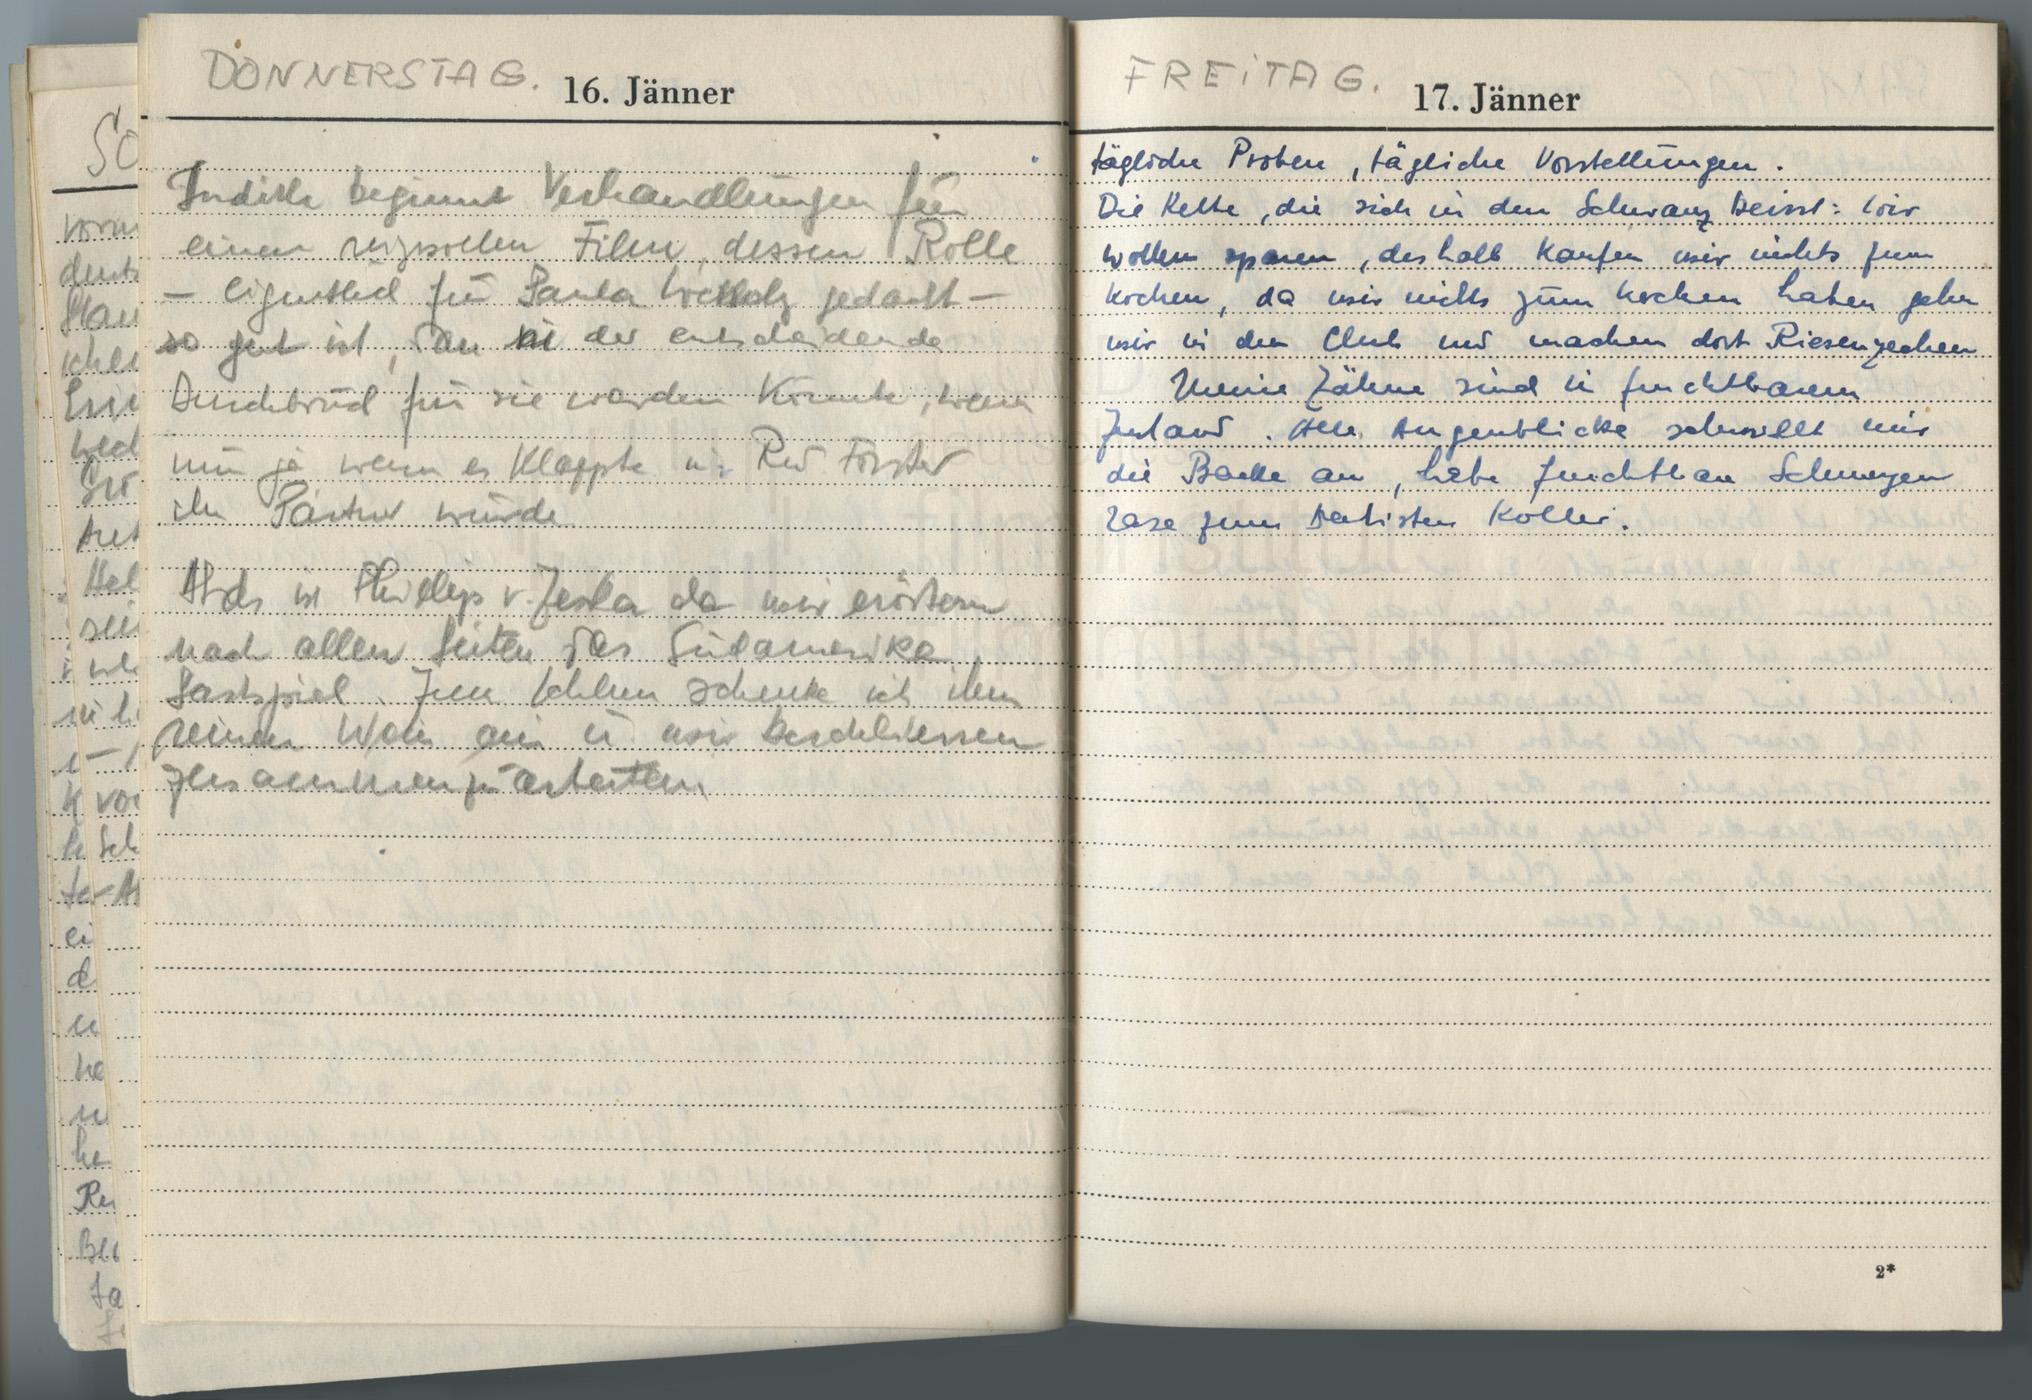 Tagebucheintrag vom 17.1.1947